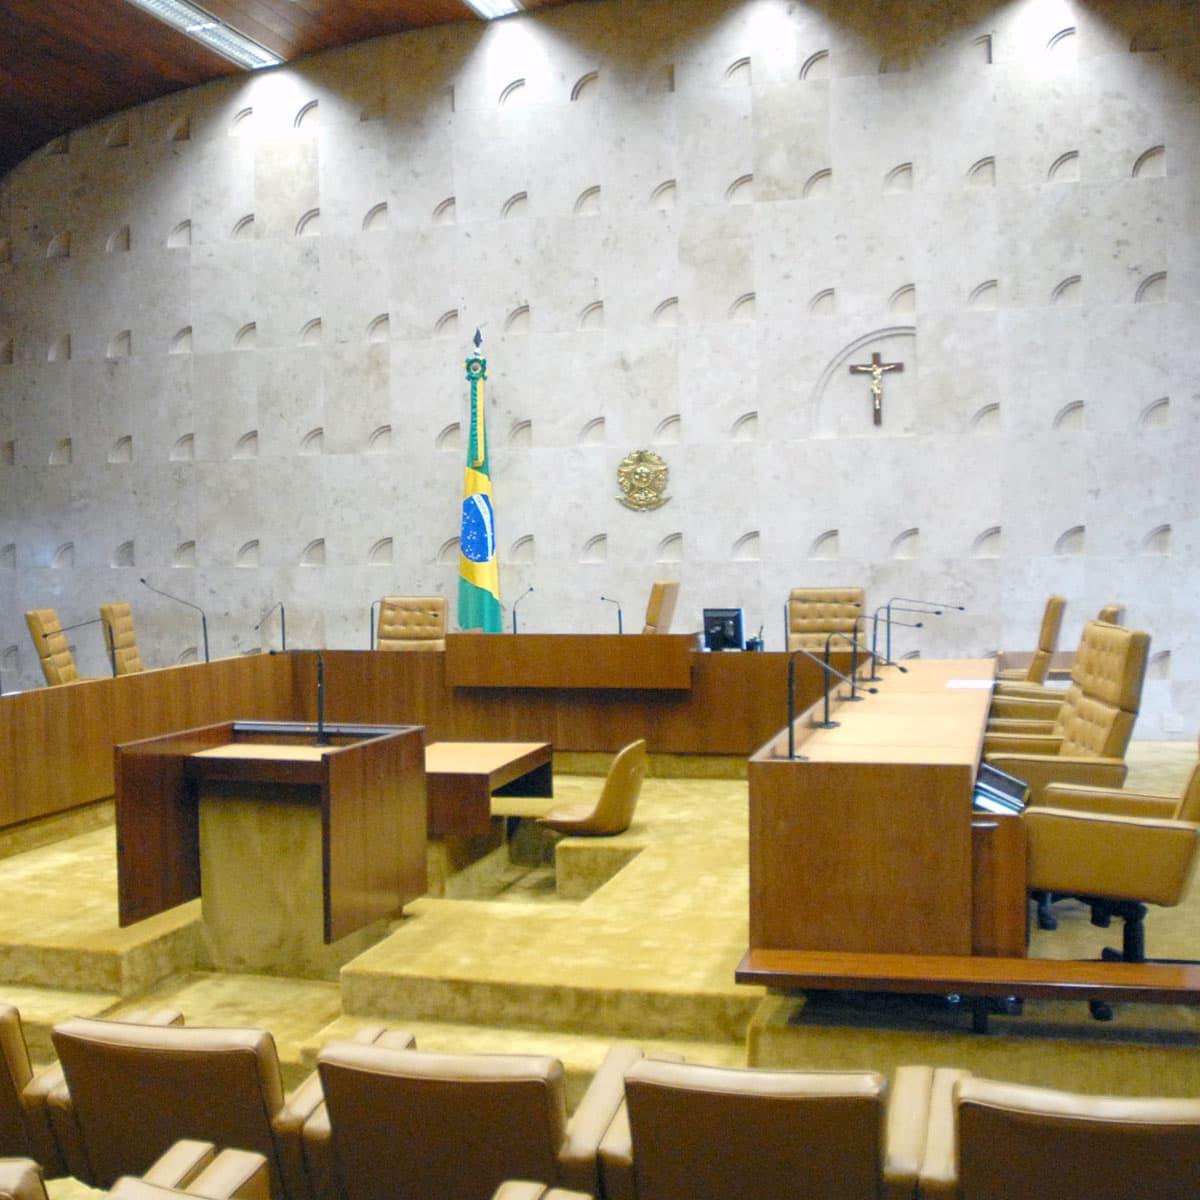 Crise de legimidade da Suprema Corte brasileira e do paradigma do controle de constitucionalidade